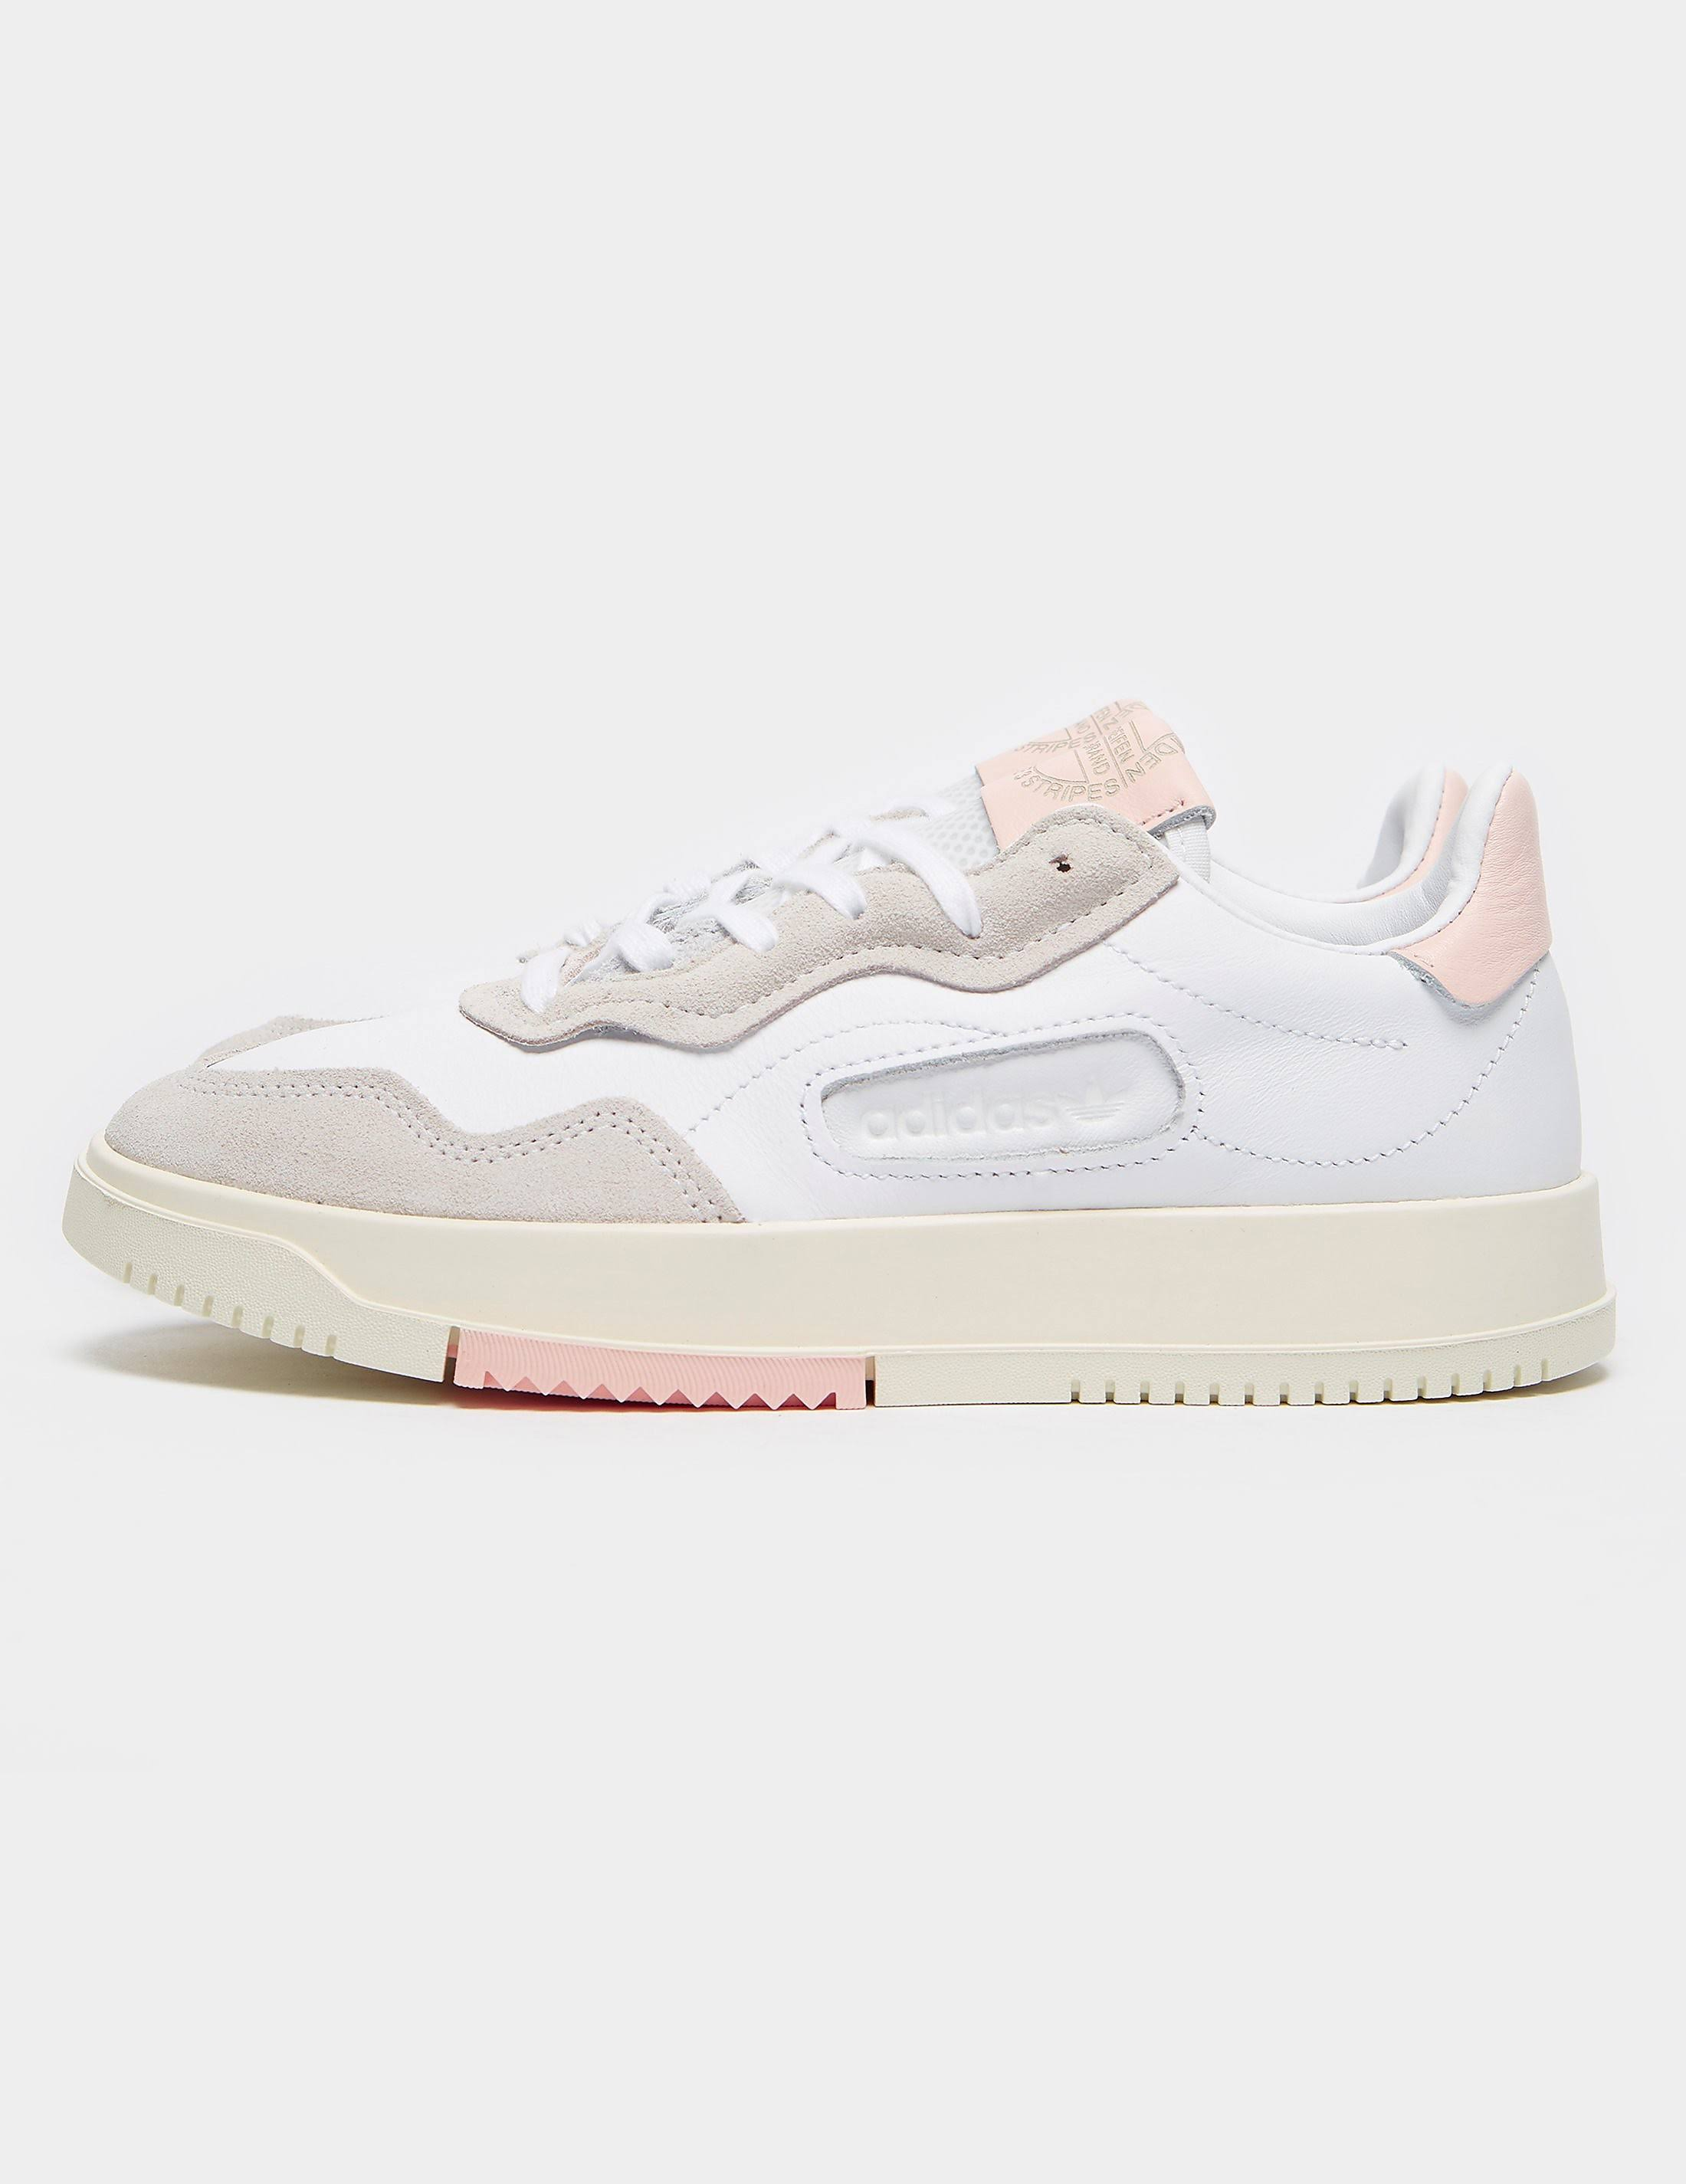 Adidas SC Premiere Shoes - White - Women